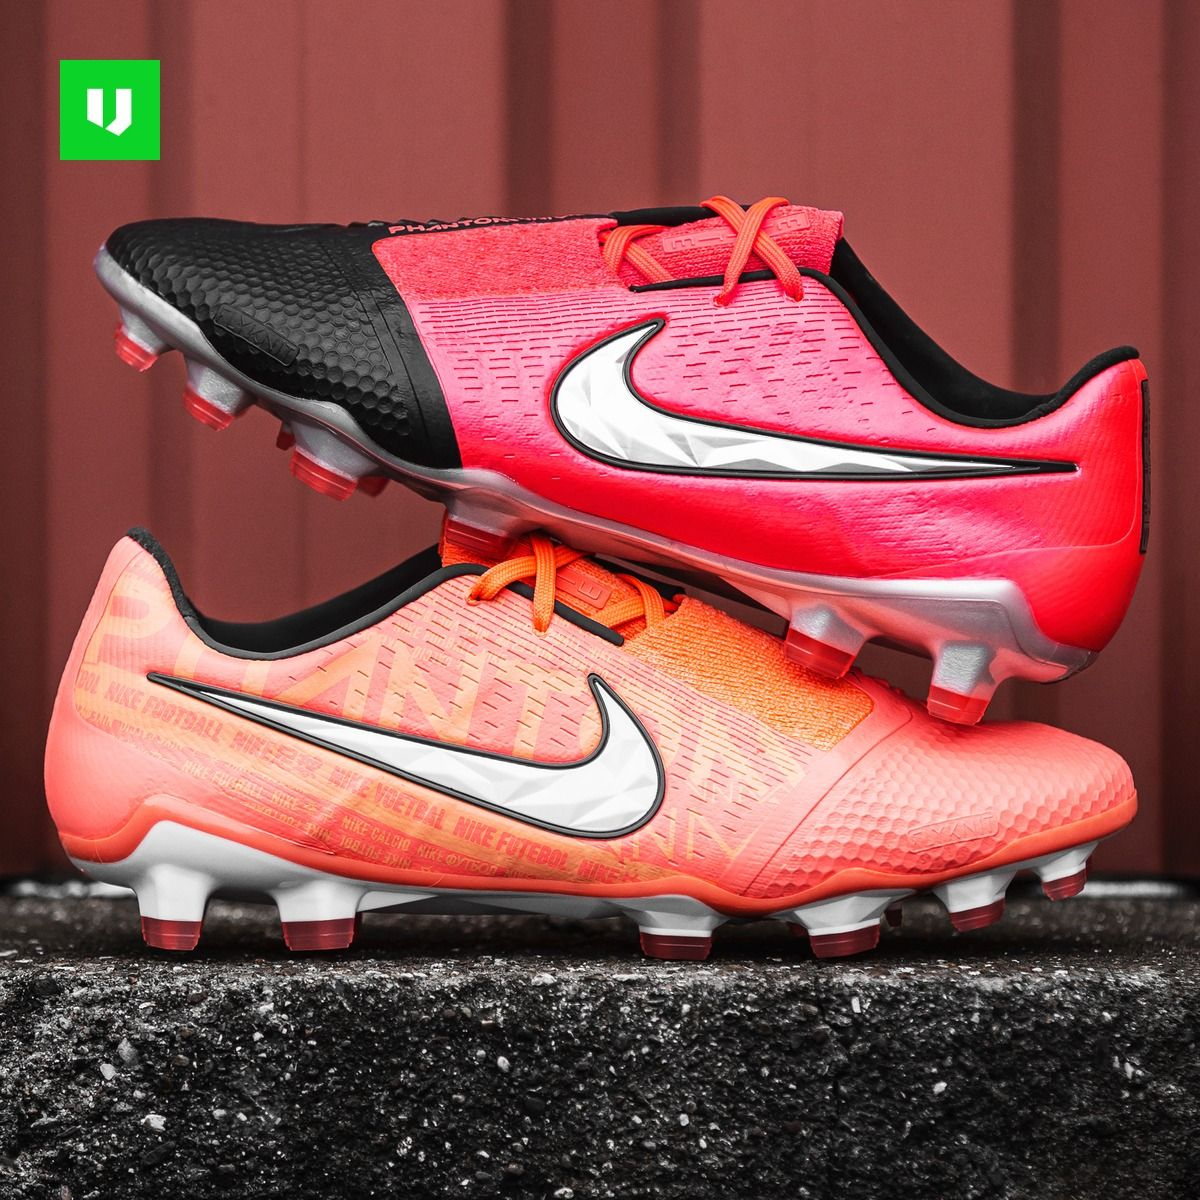 Nike PhantomVNM belongs to Fire and